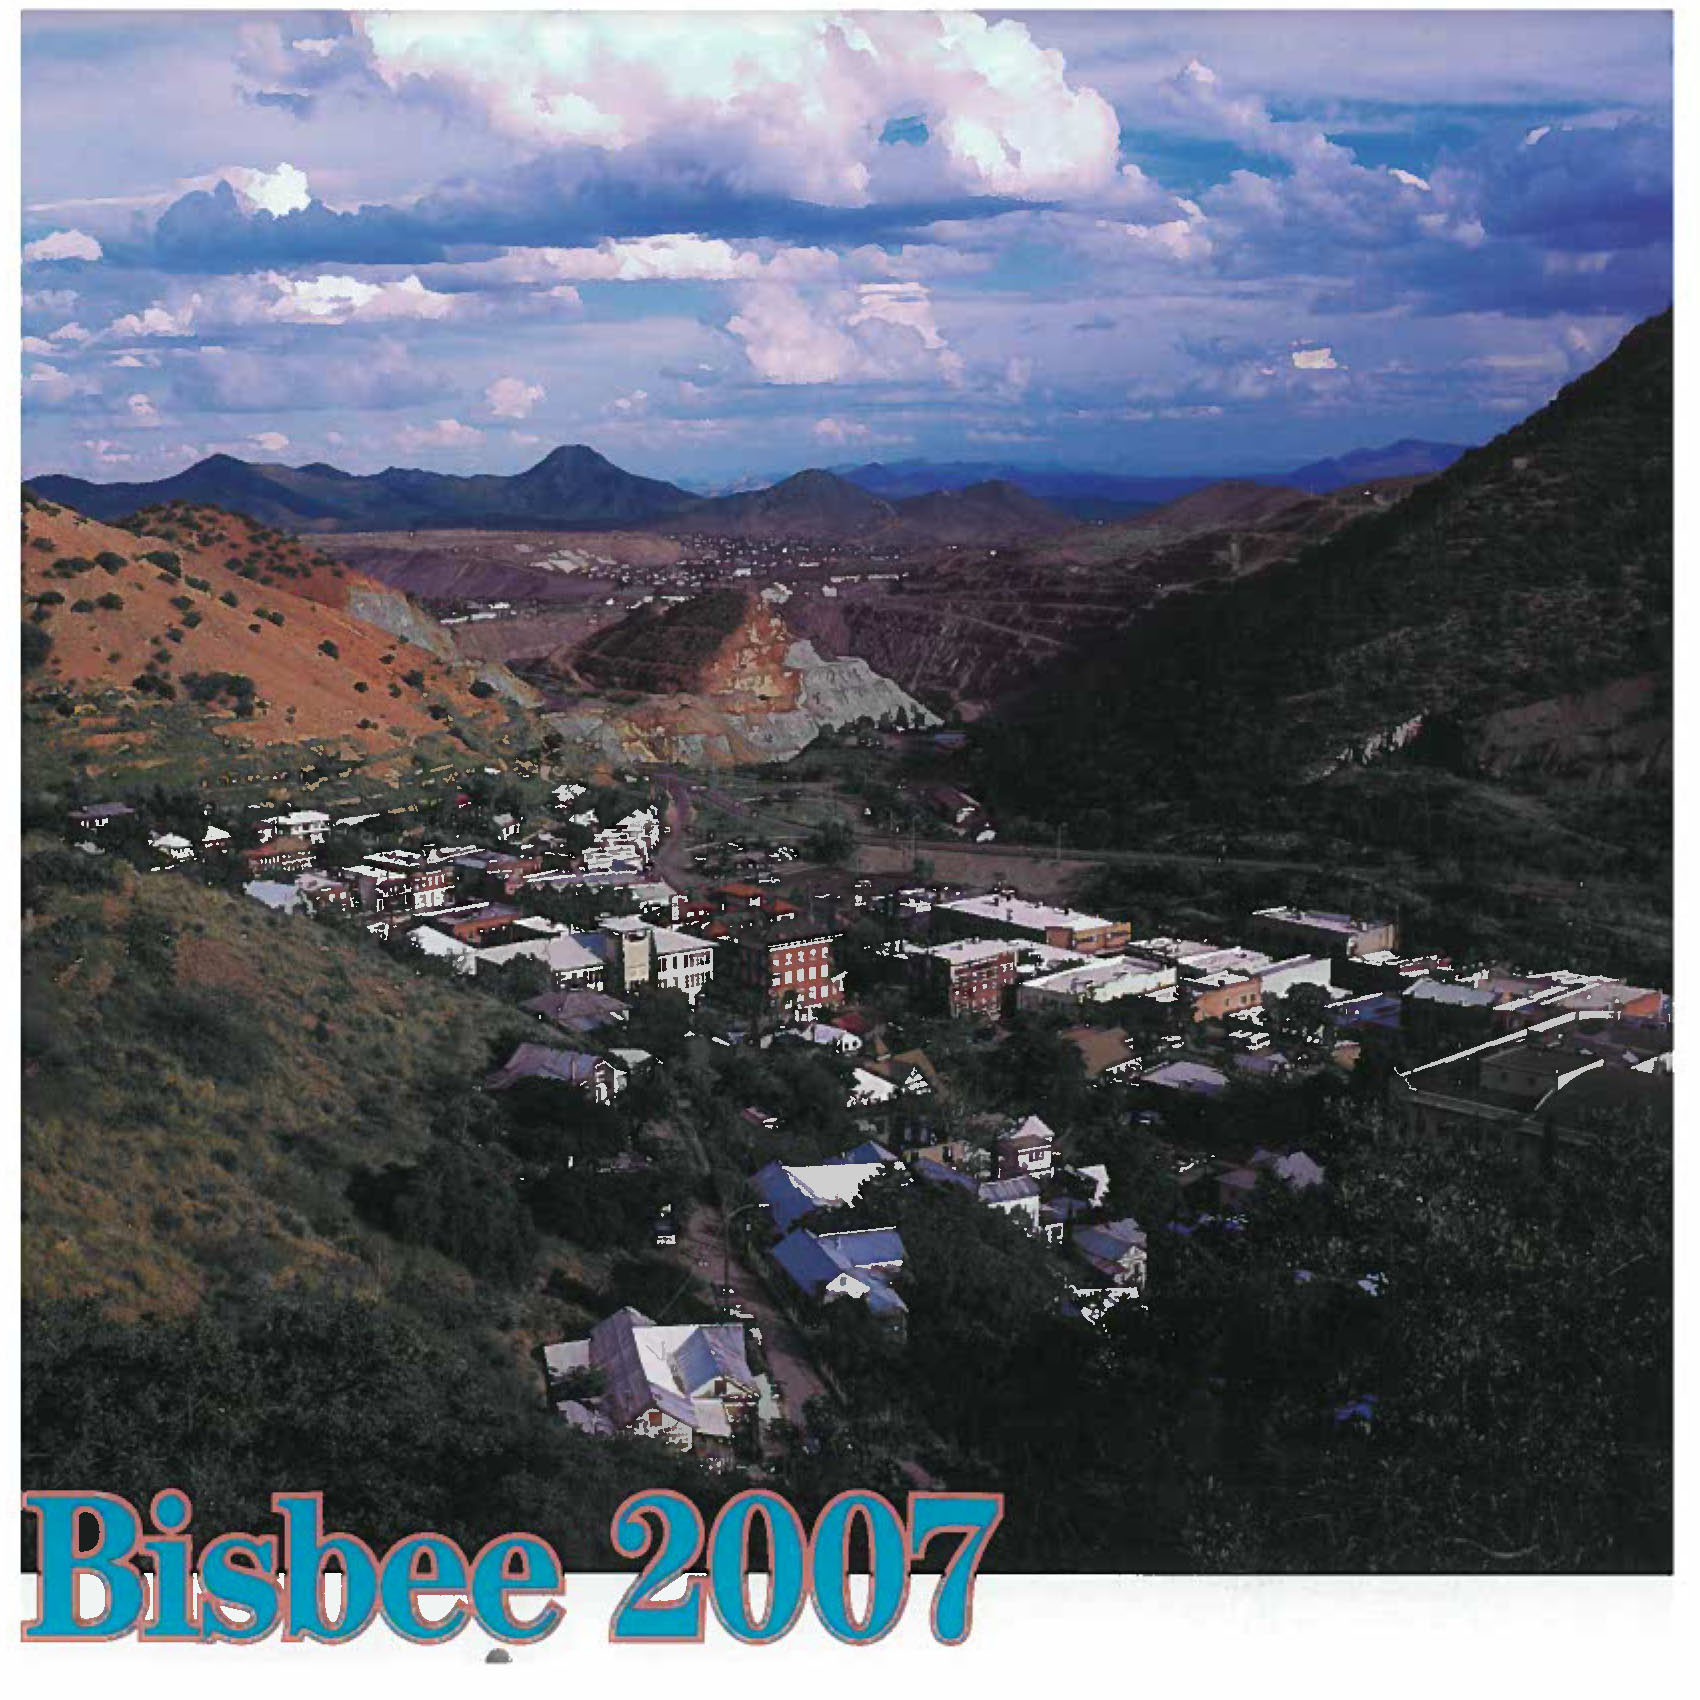 Bisbee calendar cover